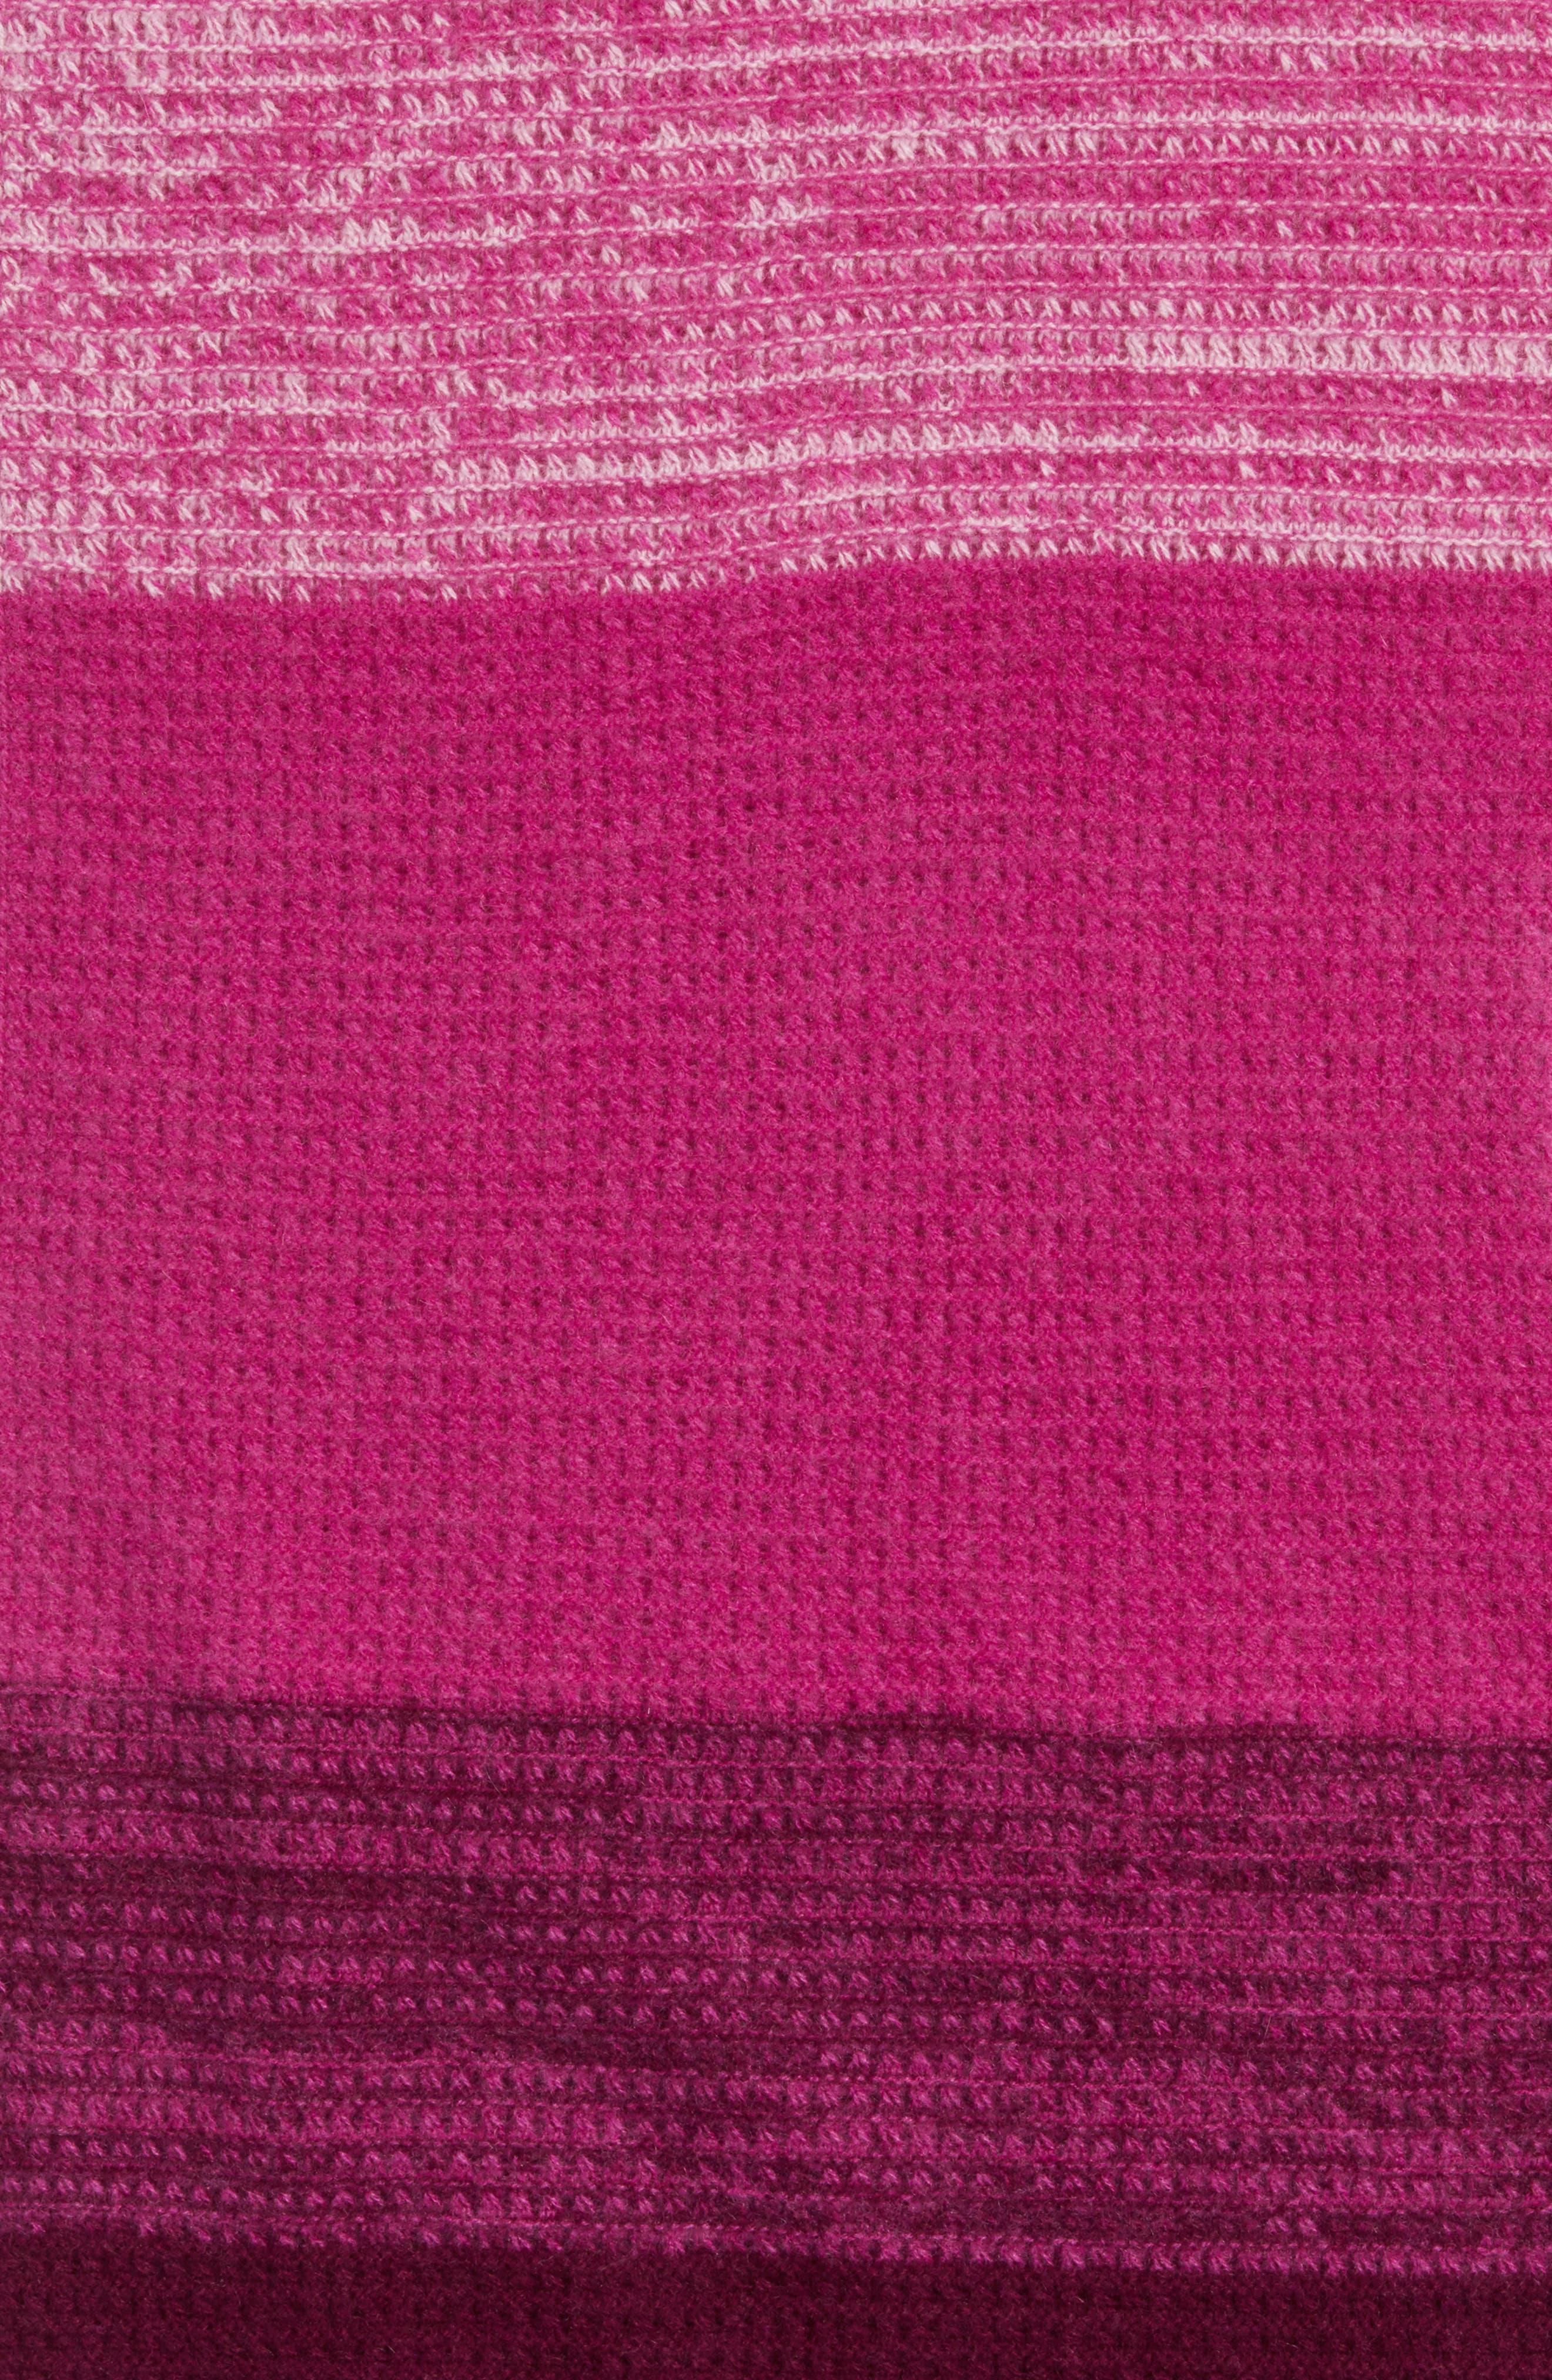 Ombré Cashmere Infinity Scarf,                             Alternate thumbnail 16, color,